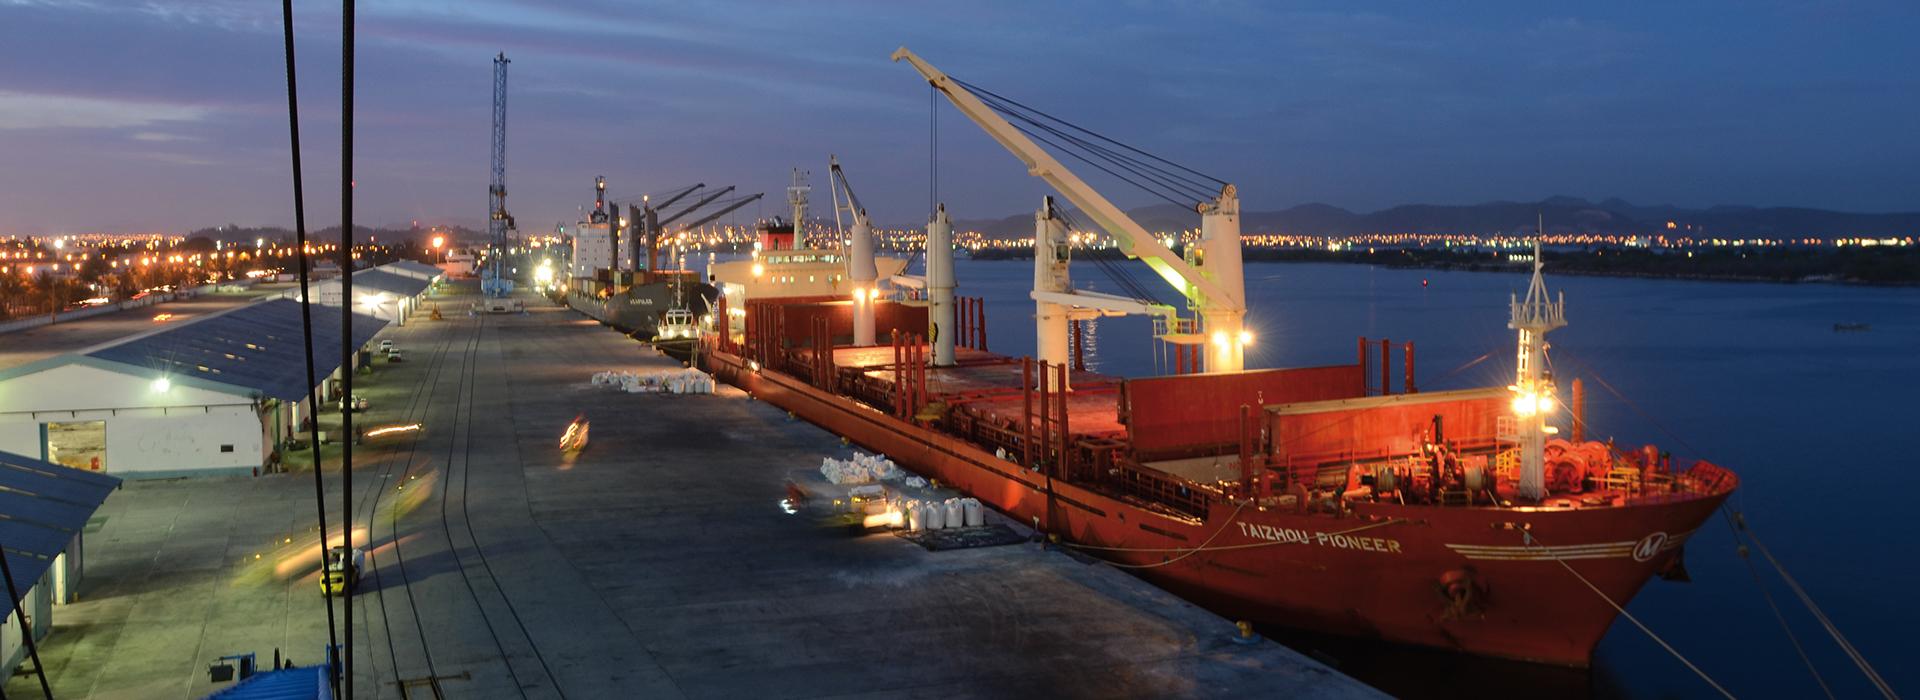 Resultado de imagen para Terminal Portuaria  sinaloa